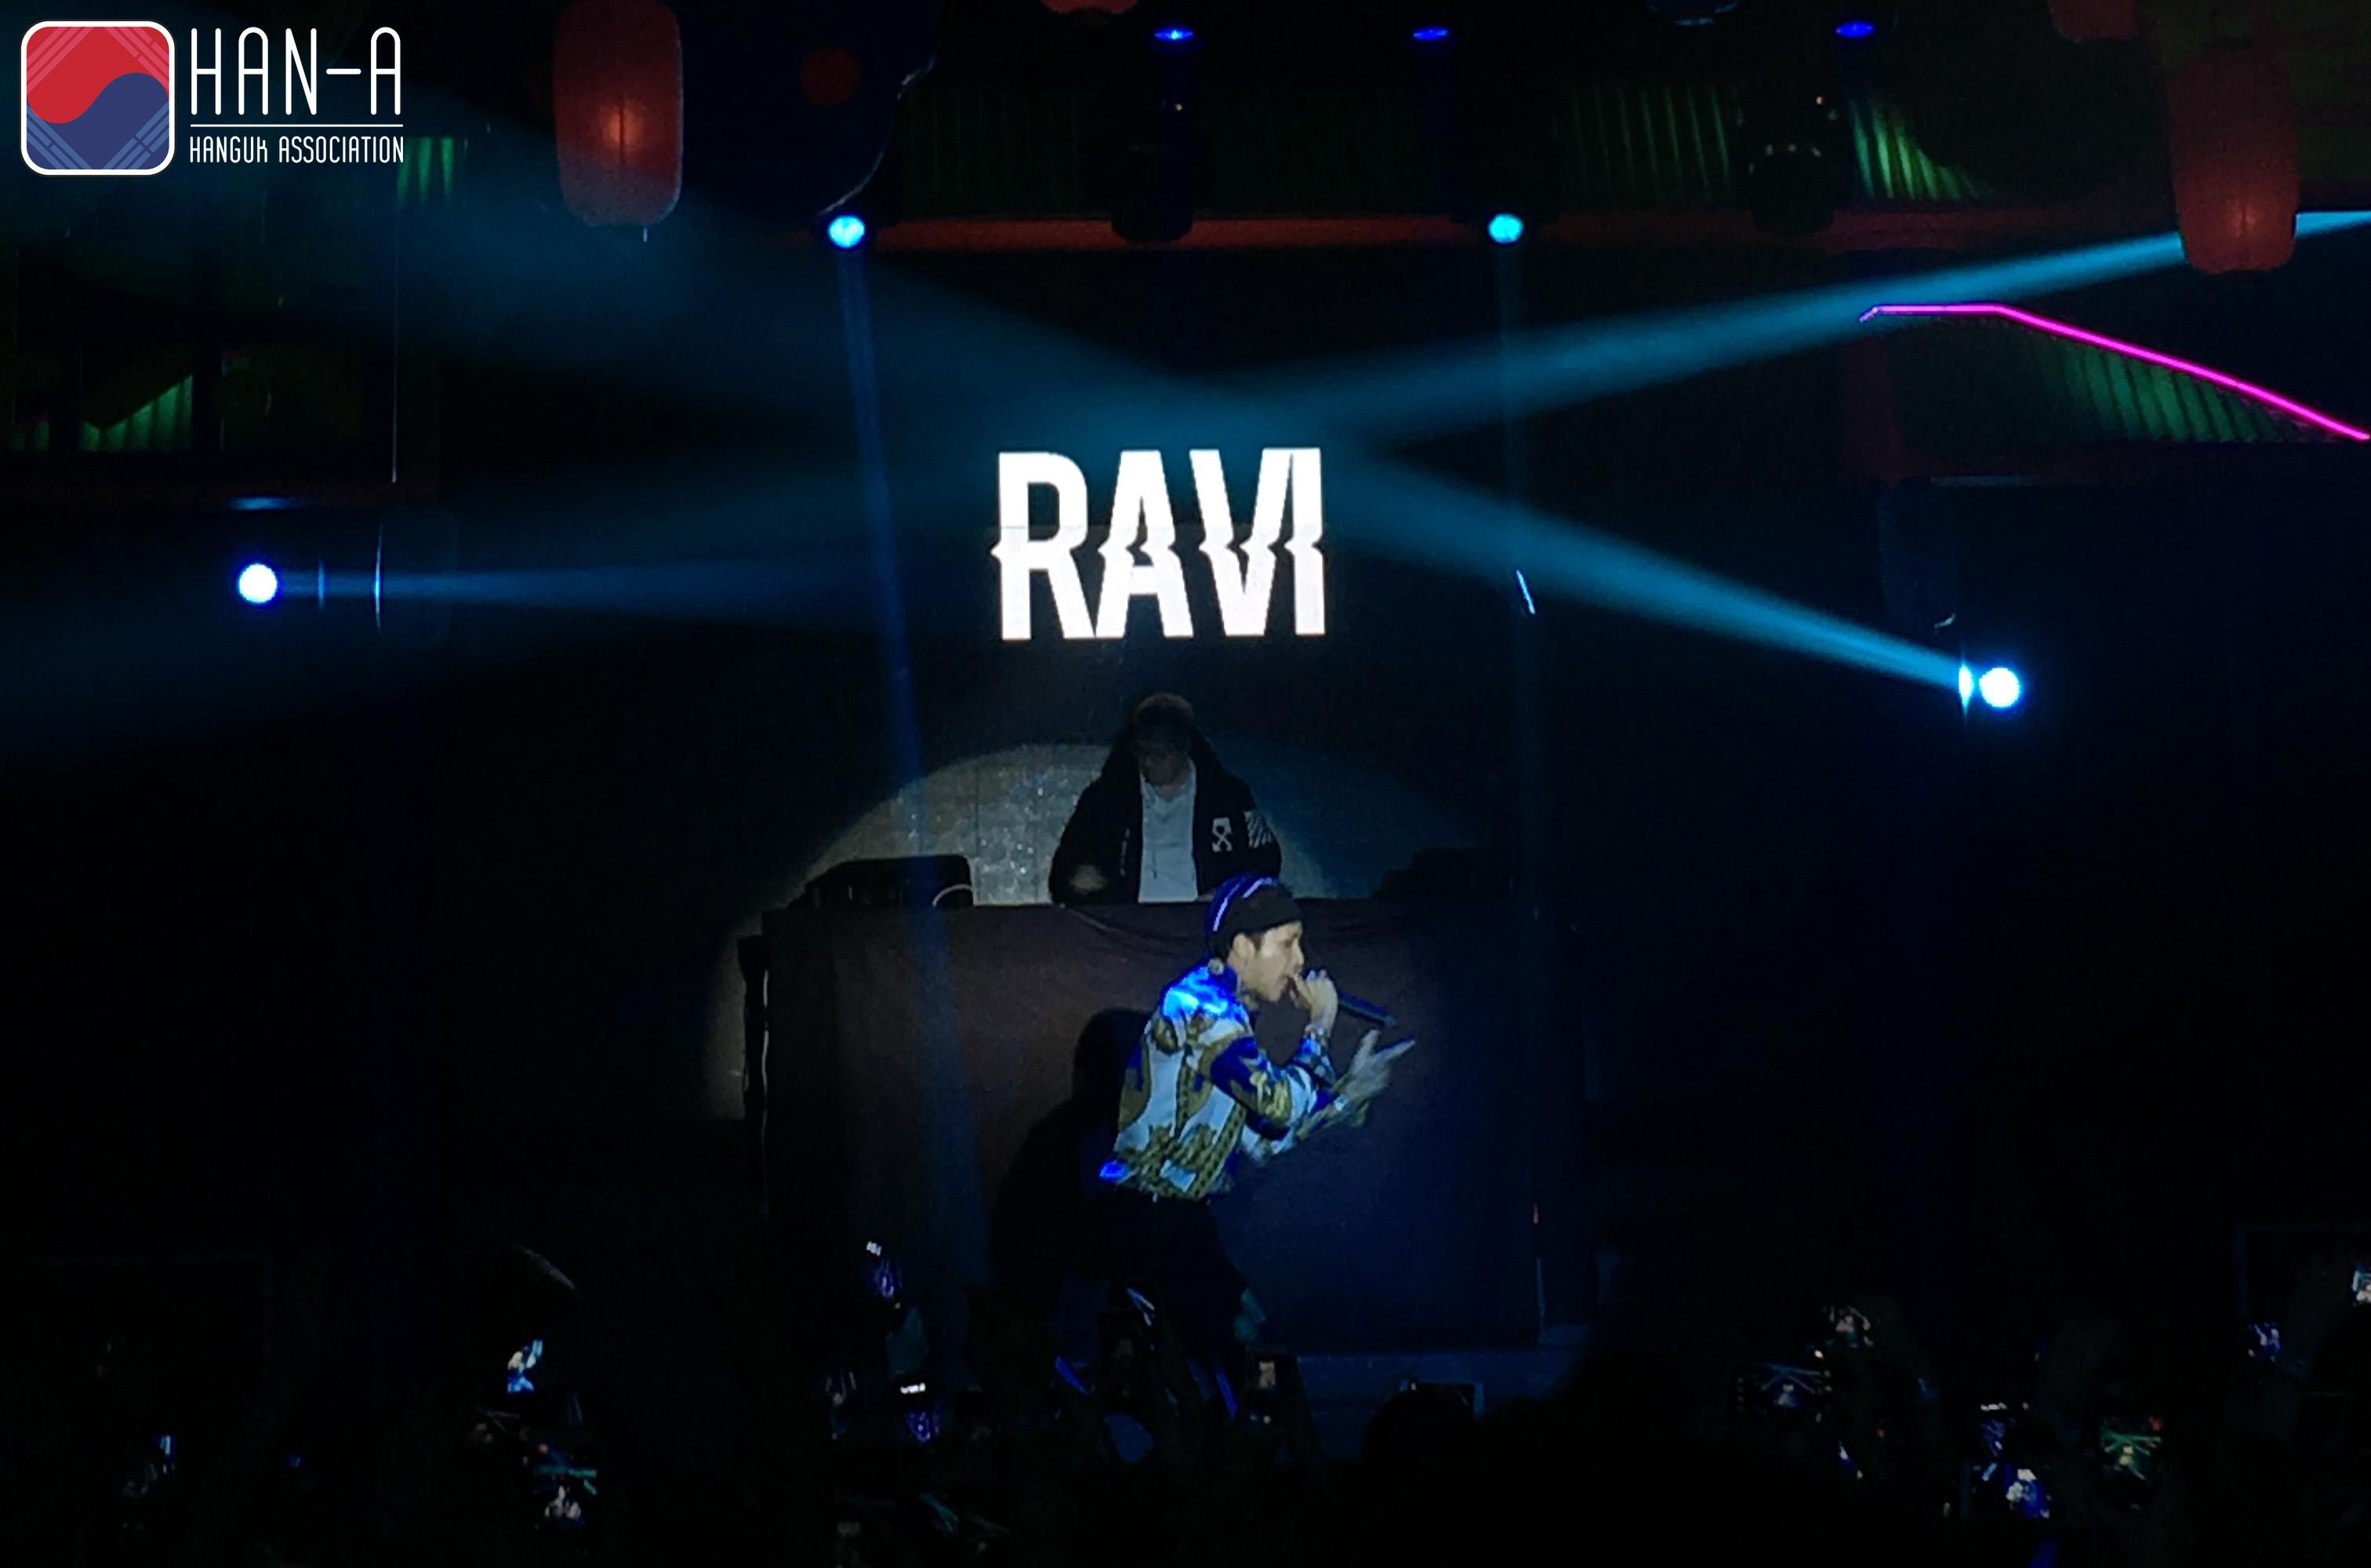 Ravi cabecera.